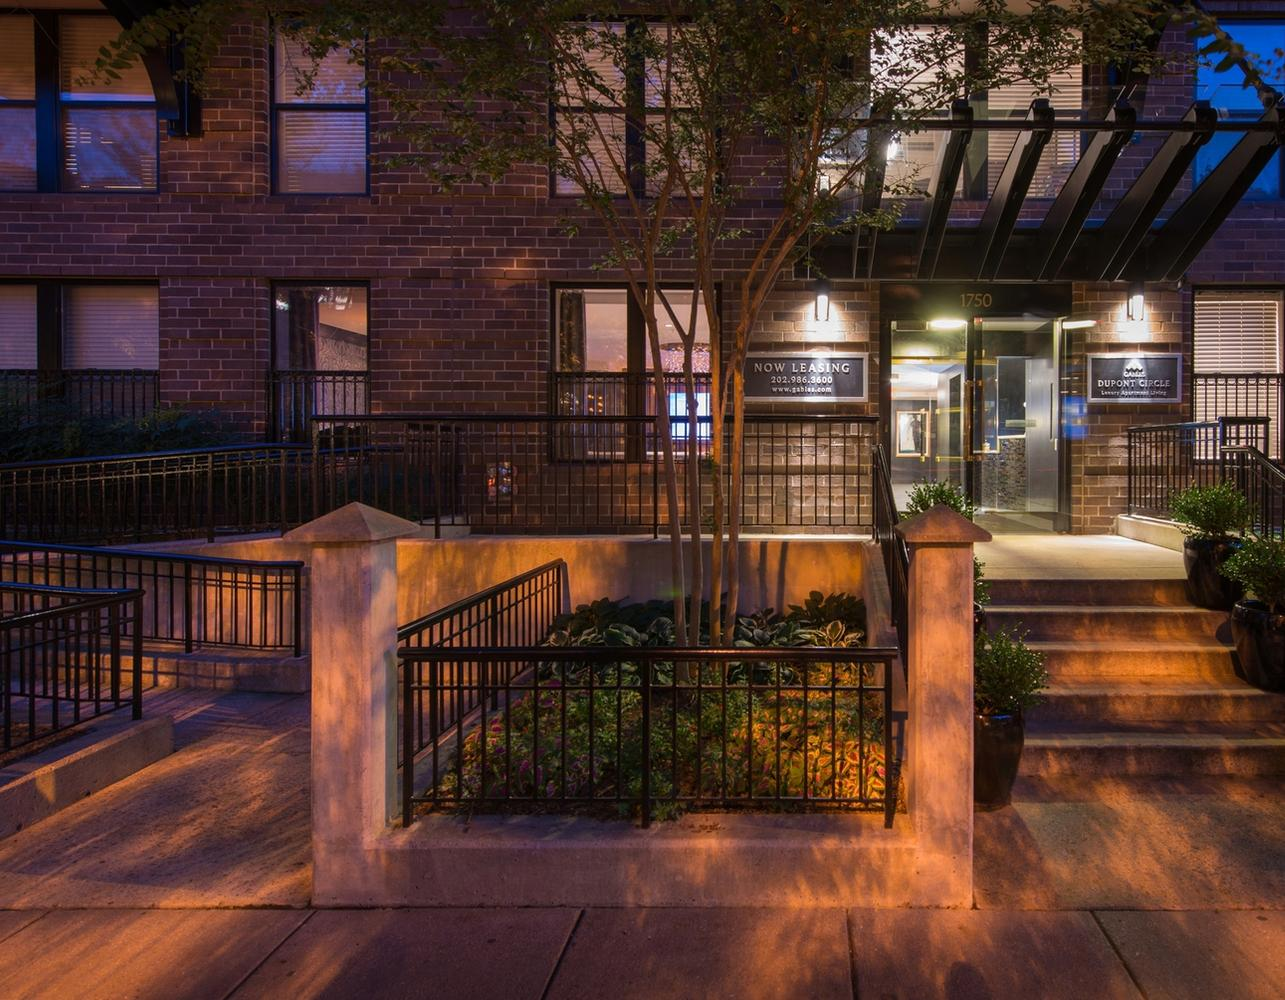 Gables Dupont Circle | Gables Residential Communities